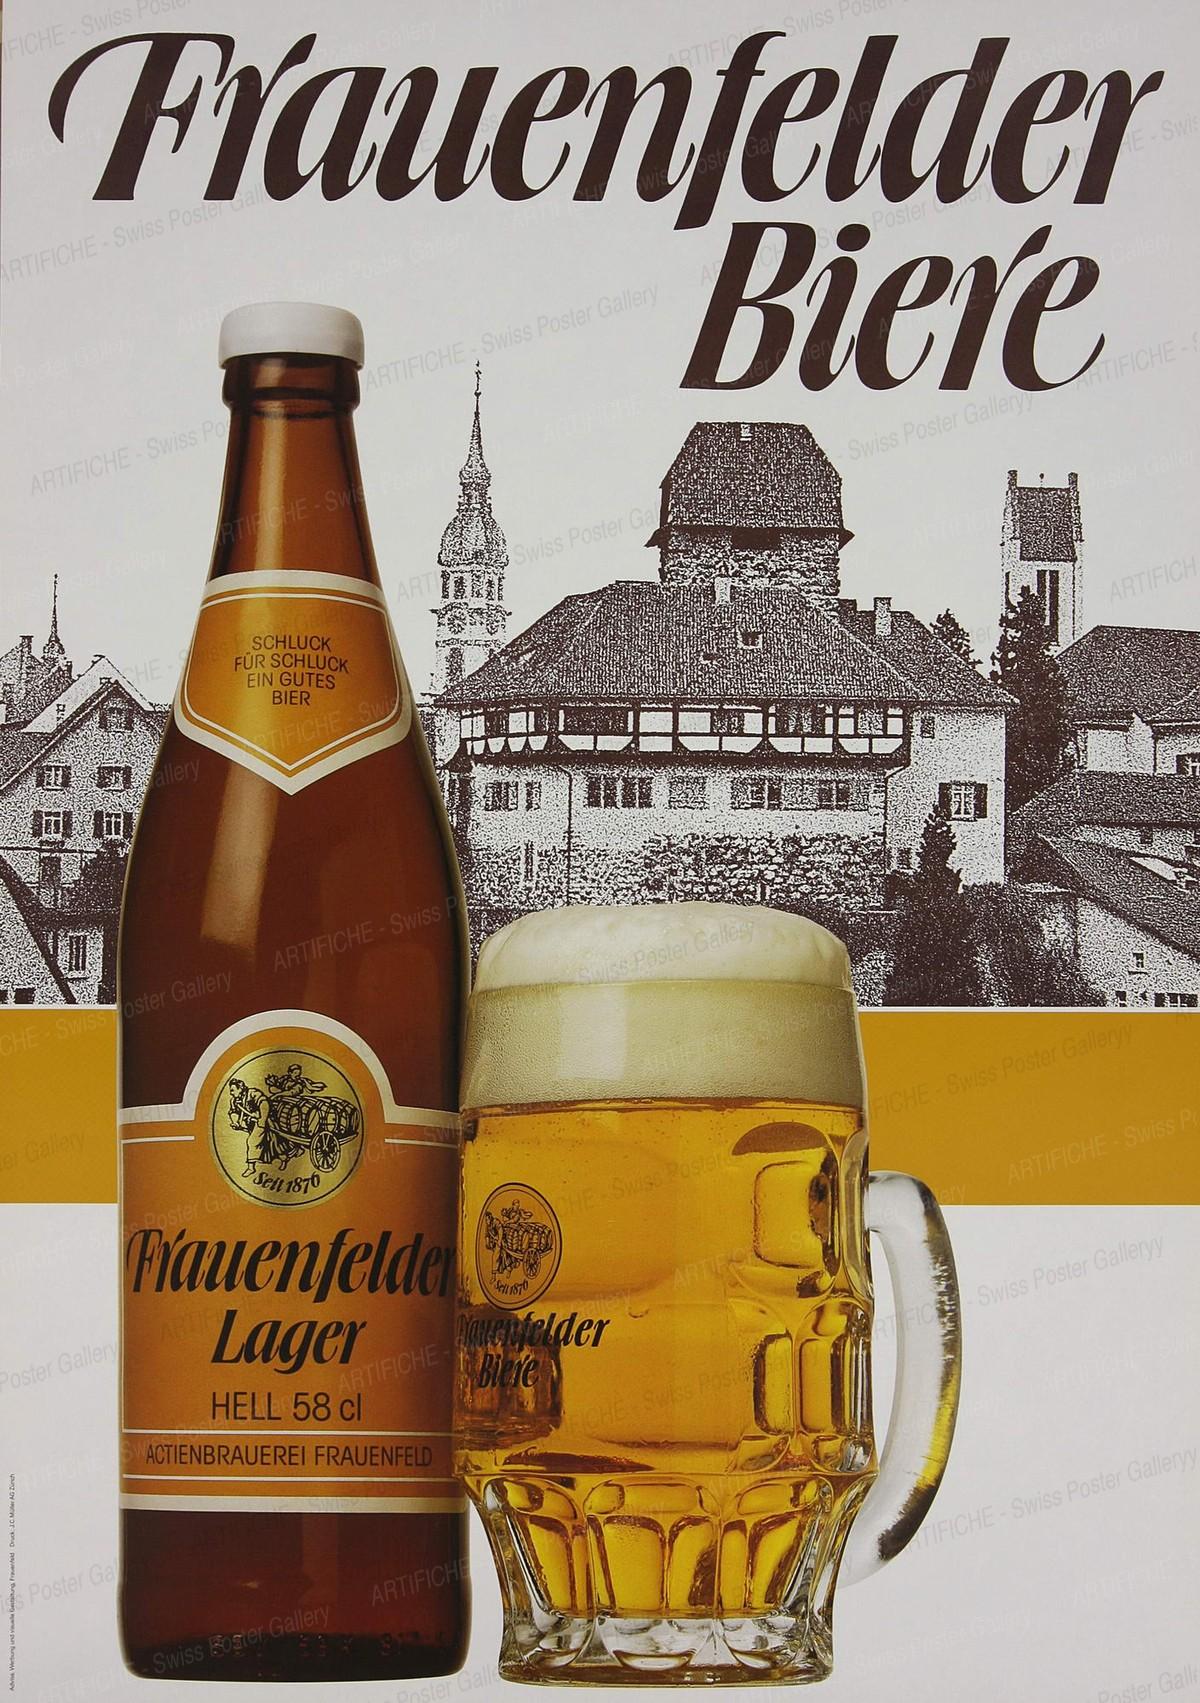 Frauenfelder Biere, Advisa Werbung & Visuelle Gestaltung (Advertising Agency)